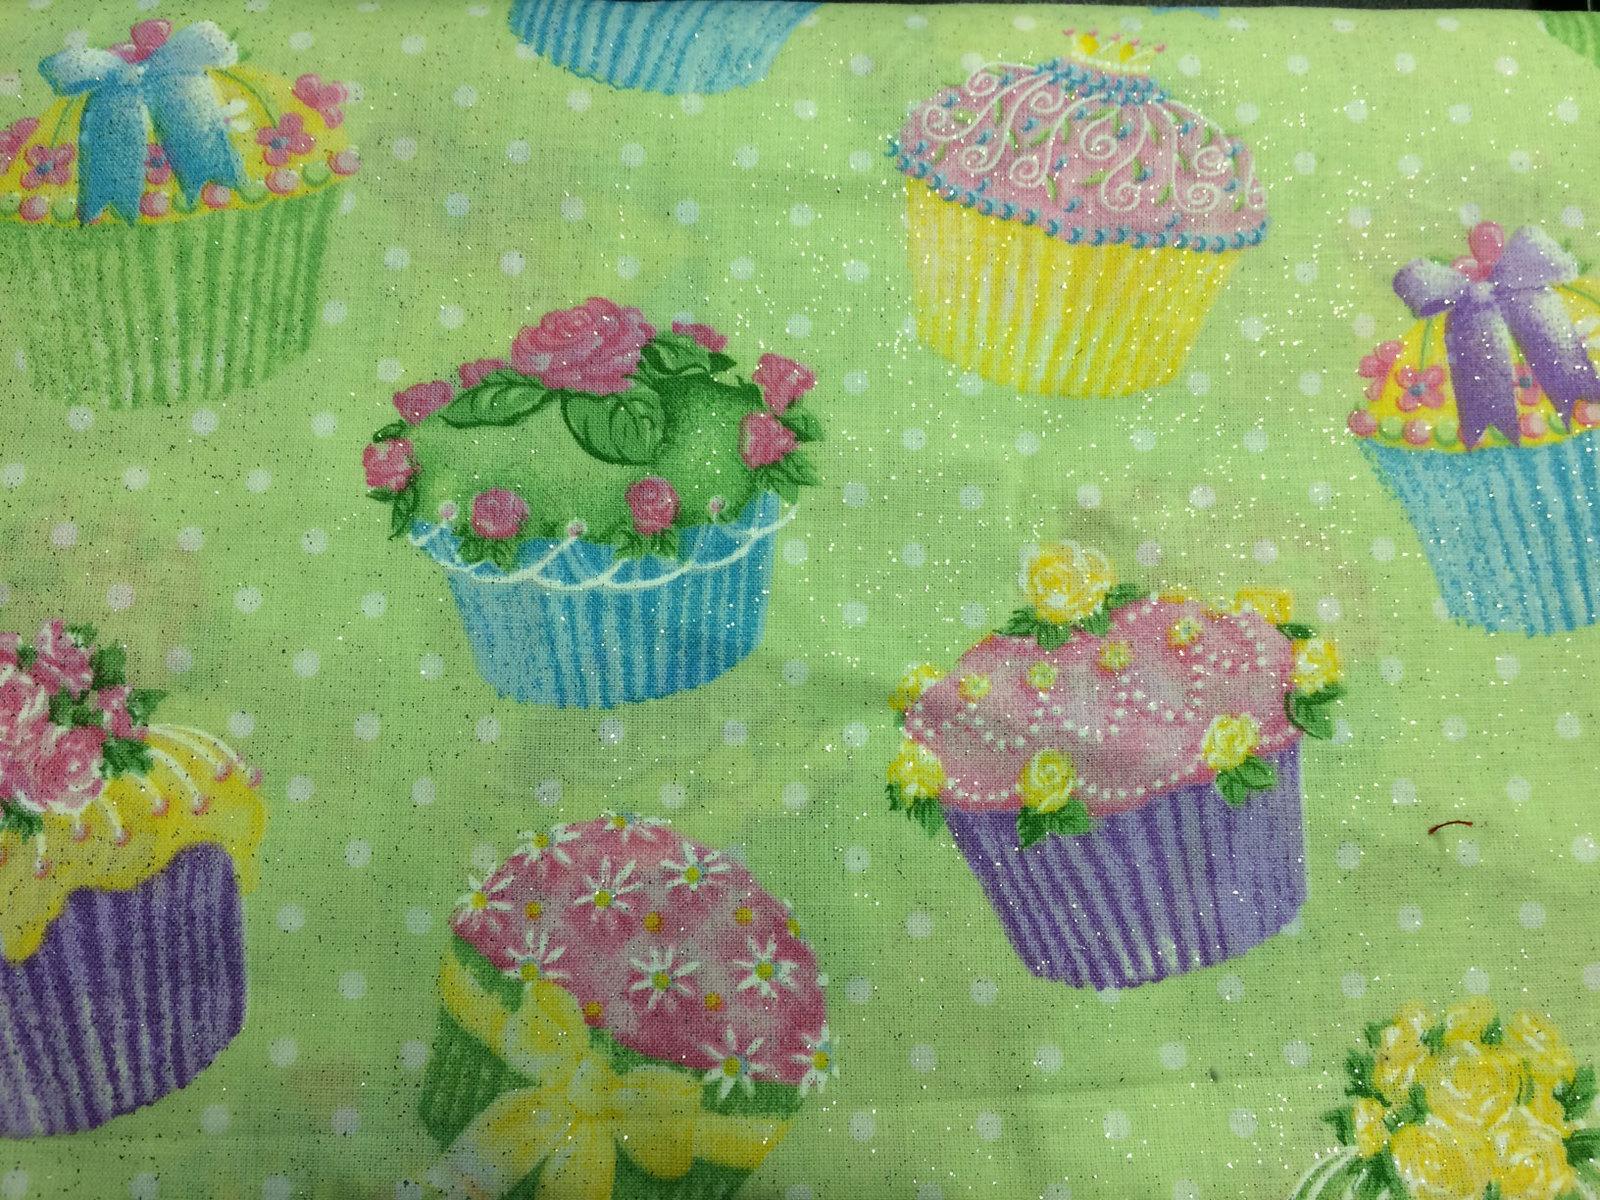 Glittery Cupcakes Print 100% Cotton Fabric